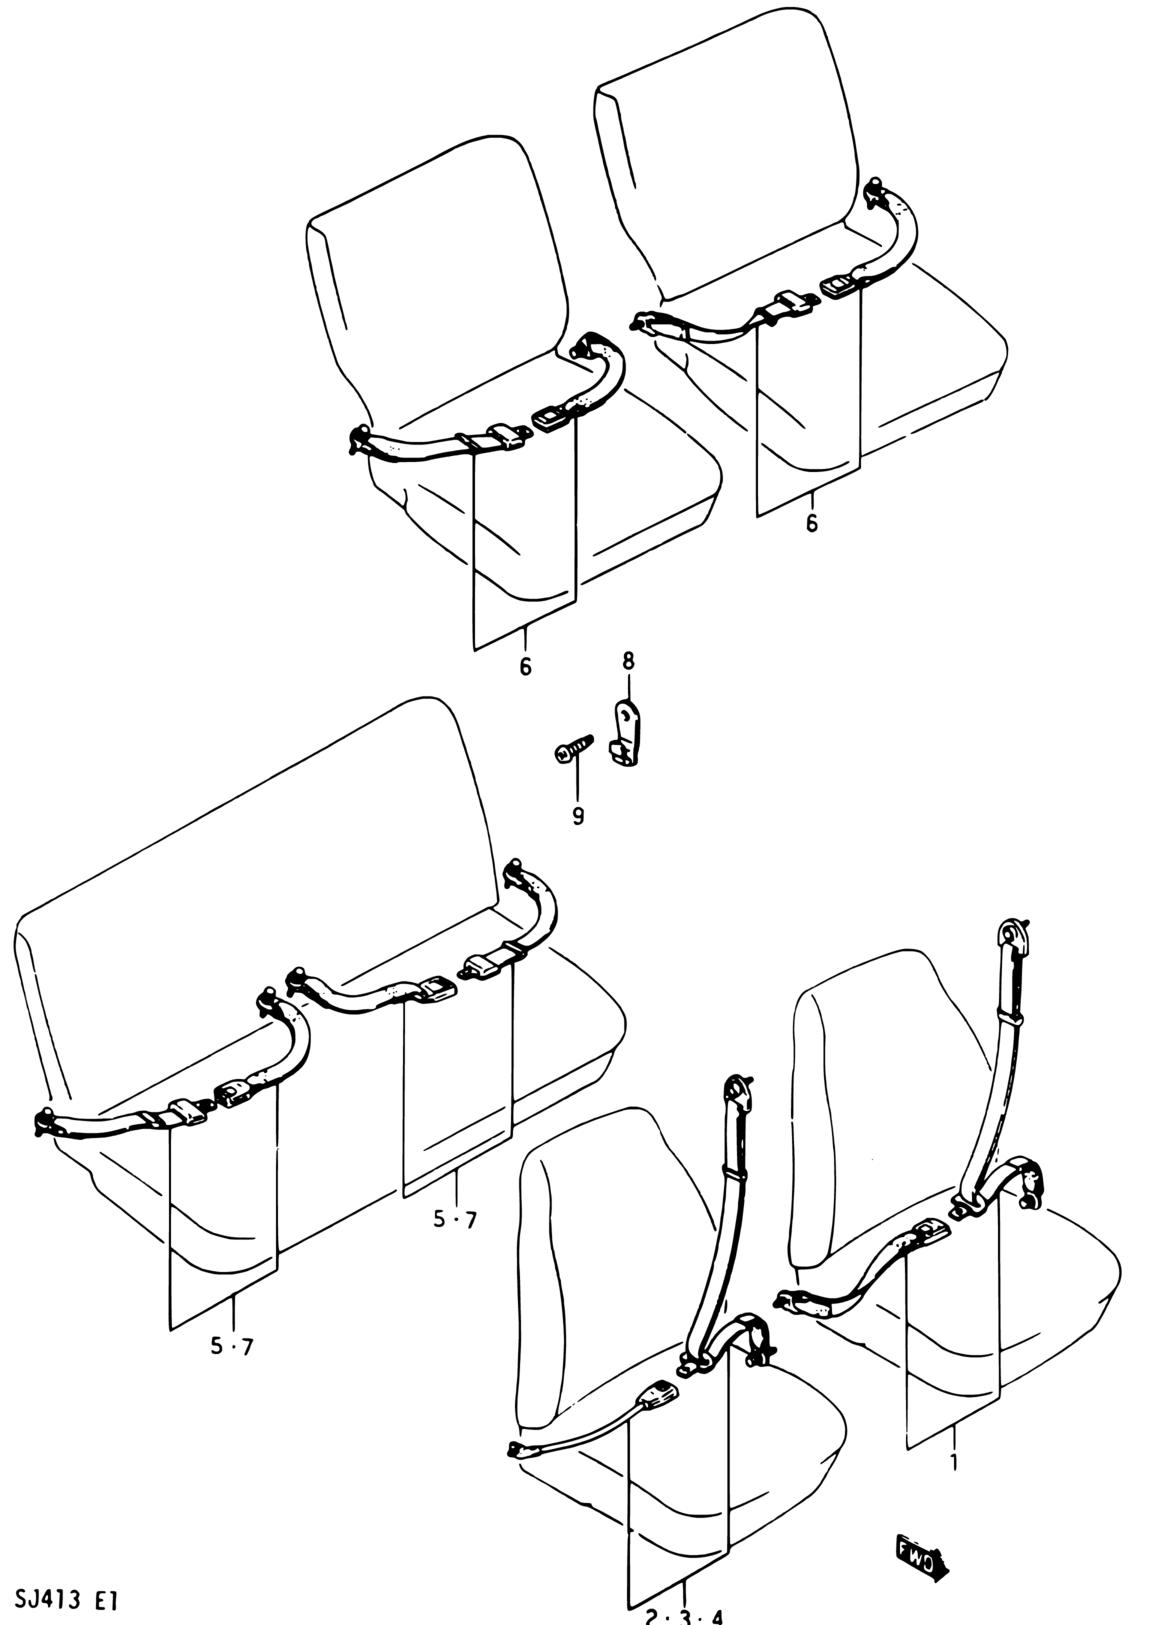 Asia Samurai Sj Sj413v E01 Interior Trim 181 Seat Belt O Type Wiring Diagram Code Part Number Name Additional Information Qty